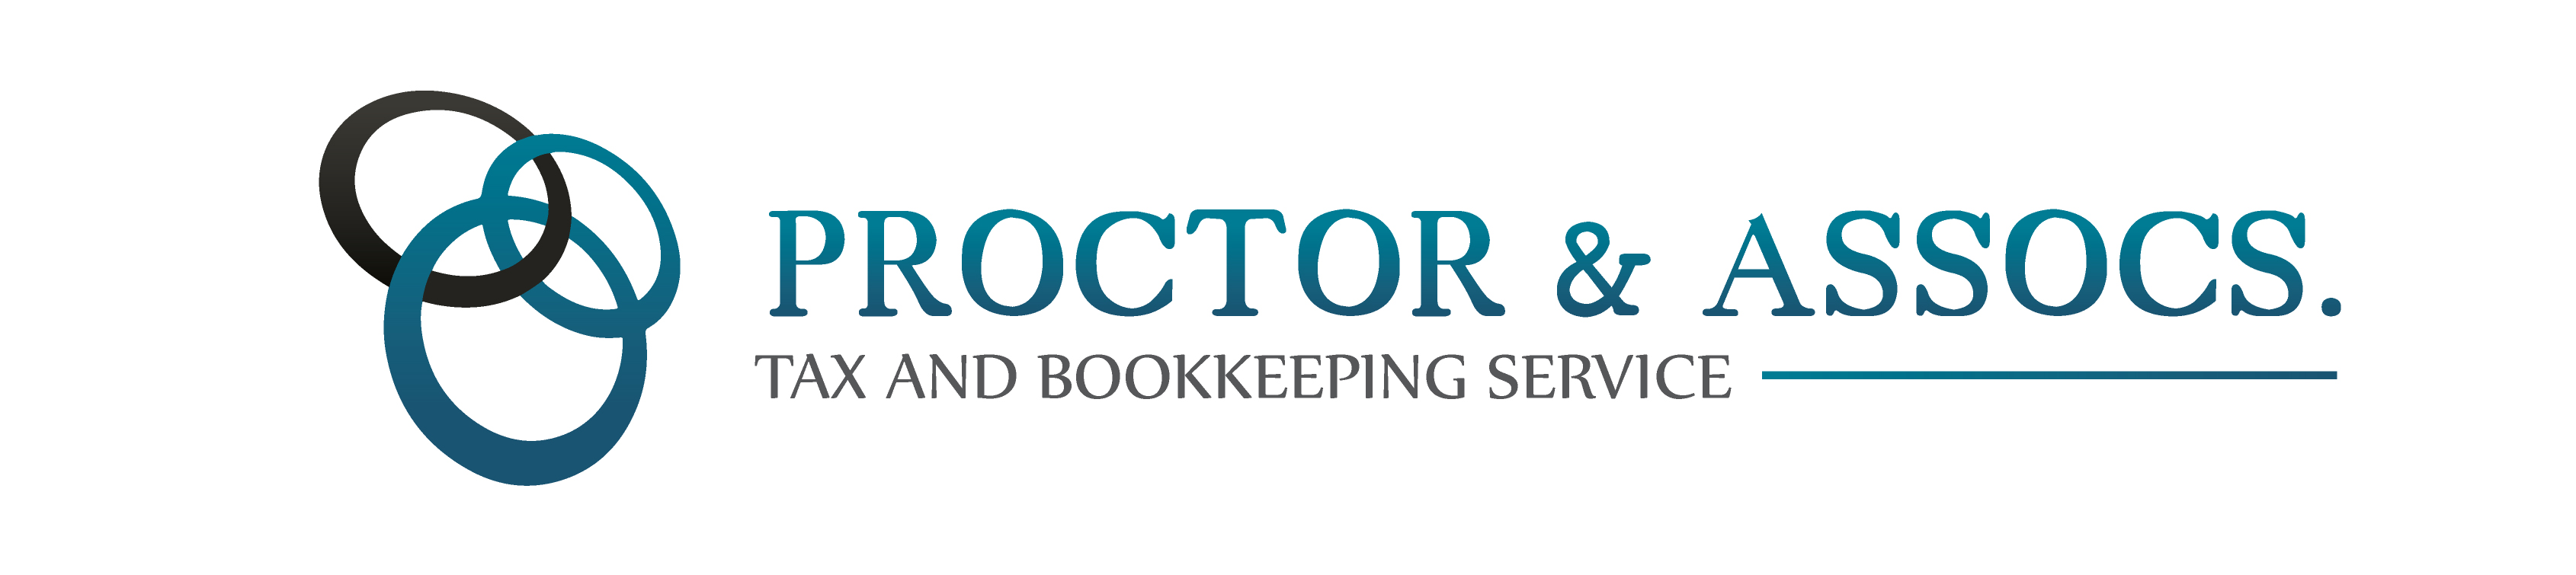 Proctor & Associates Acquires Business, Expands Services and Portfolio